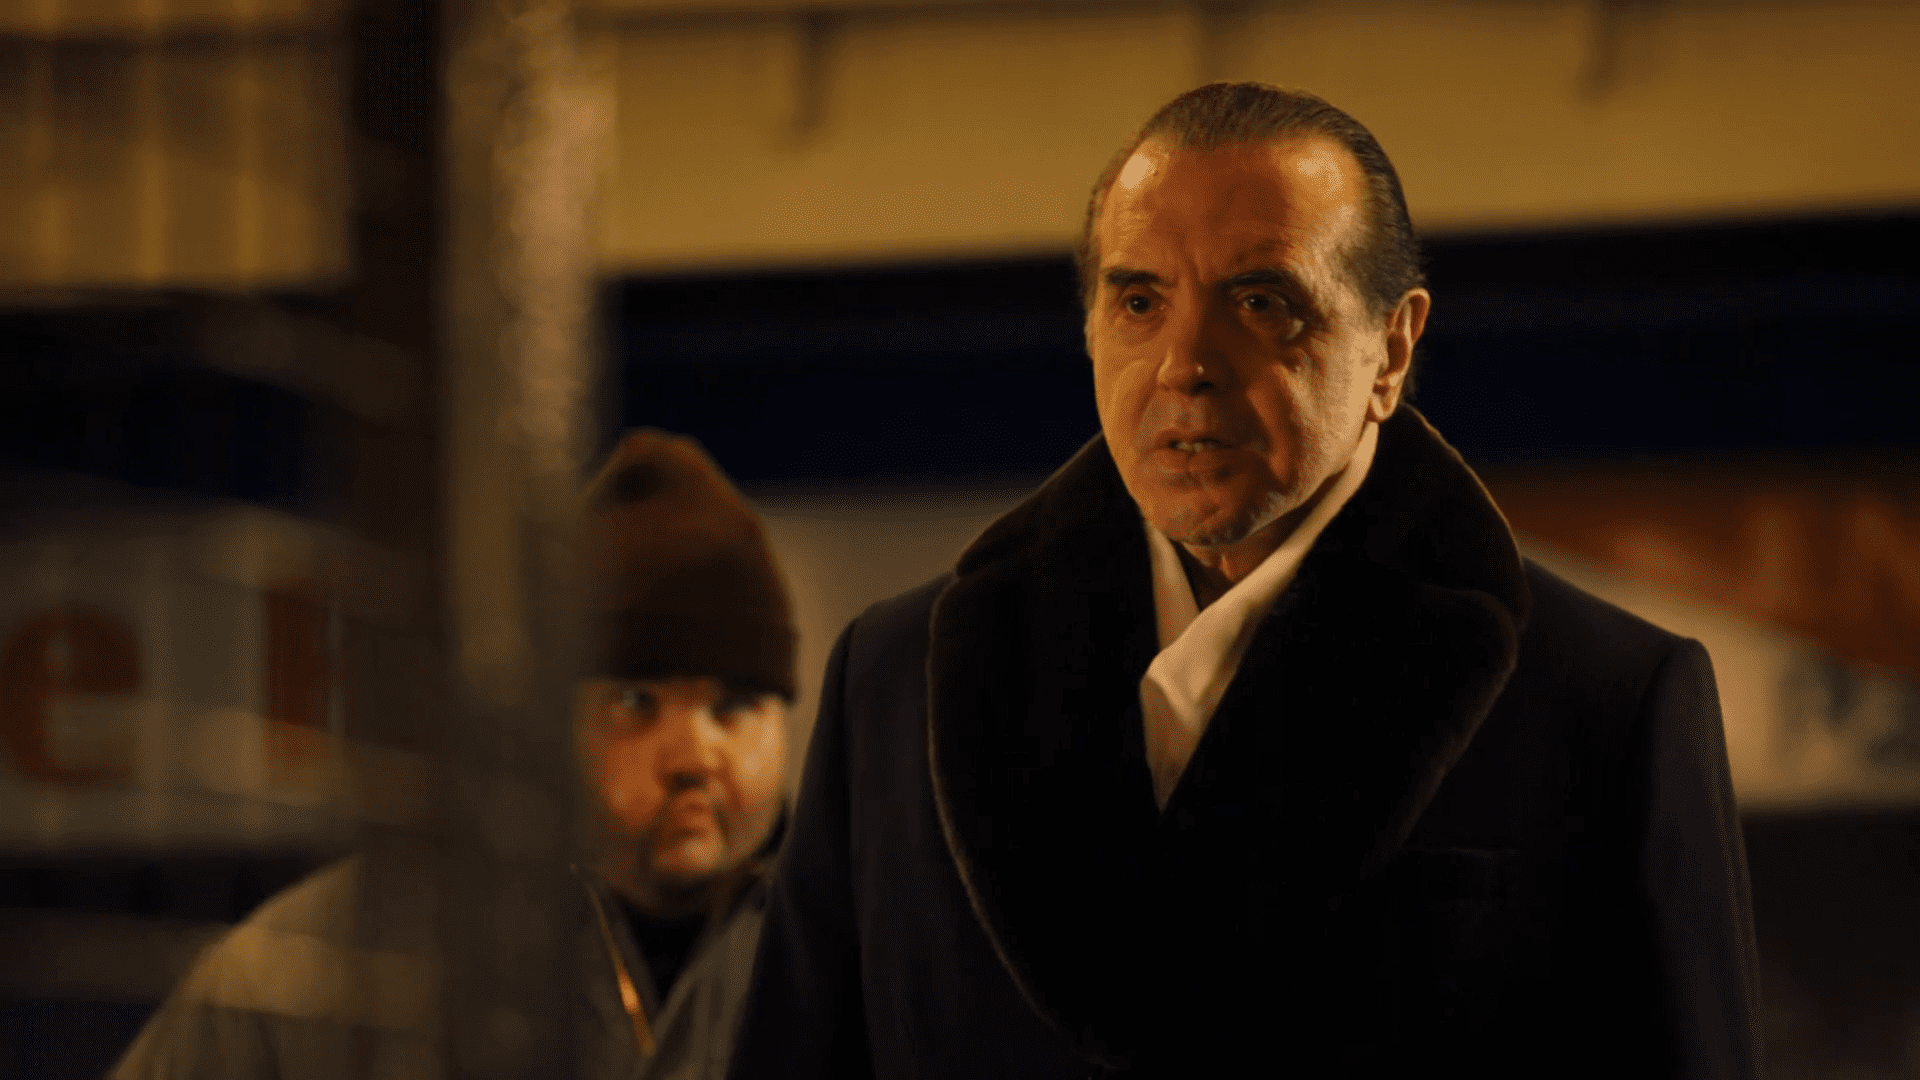 Law & Order: Organized Crime Season 1 Episode 7